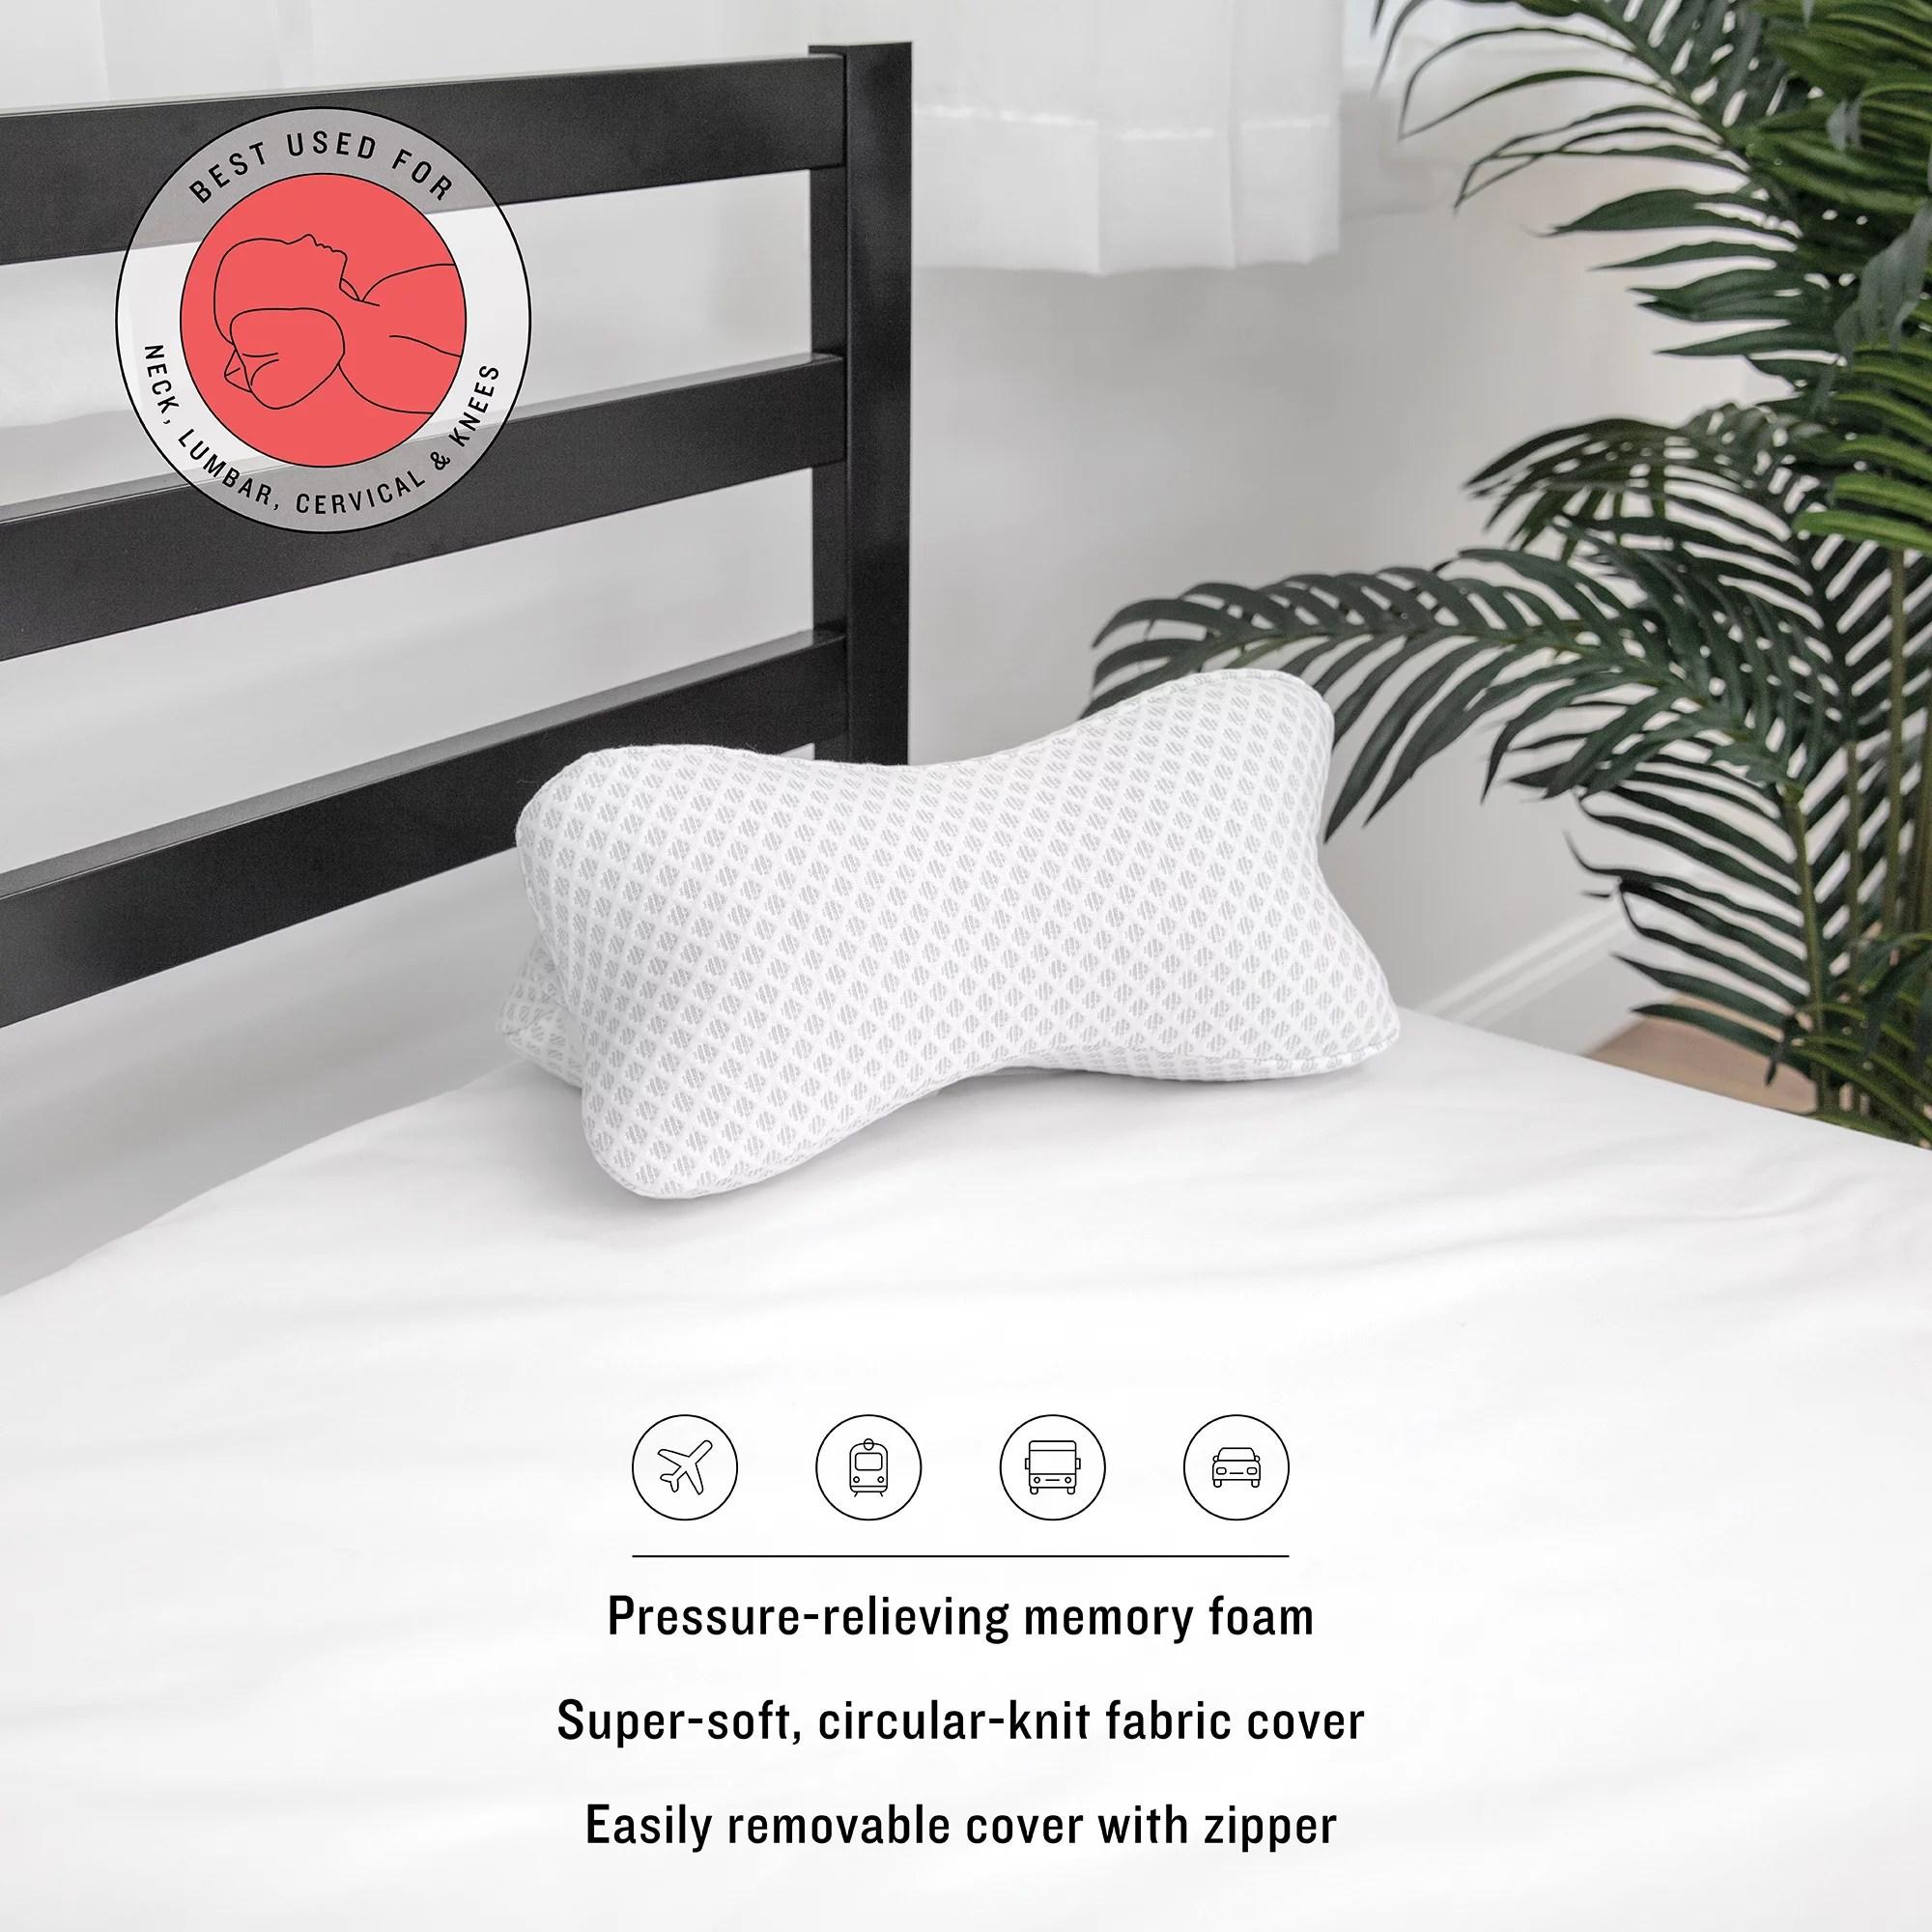 sensorpedic memory foam pillows